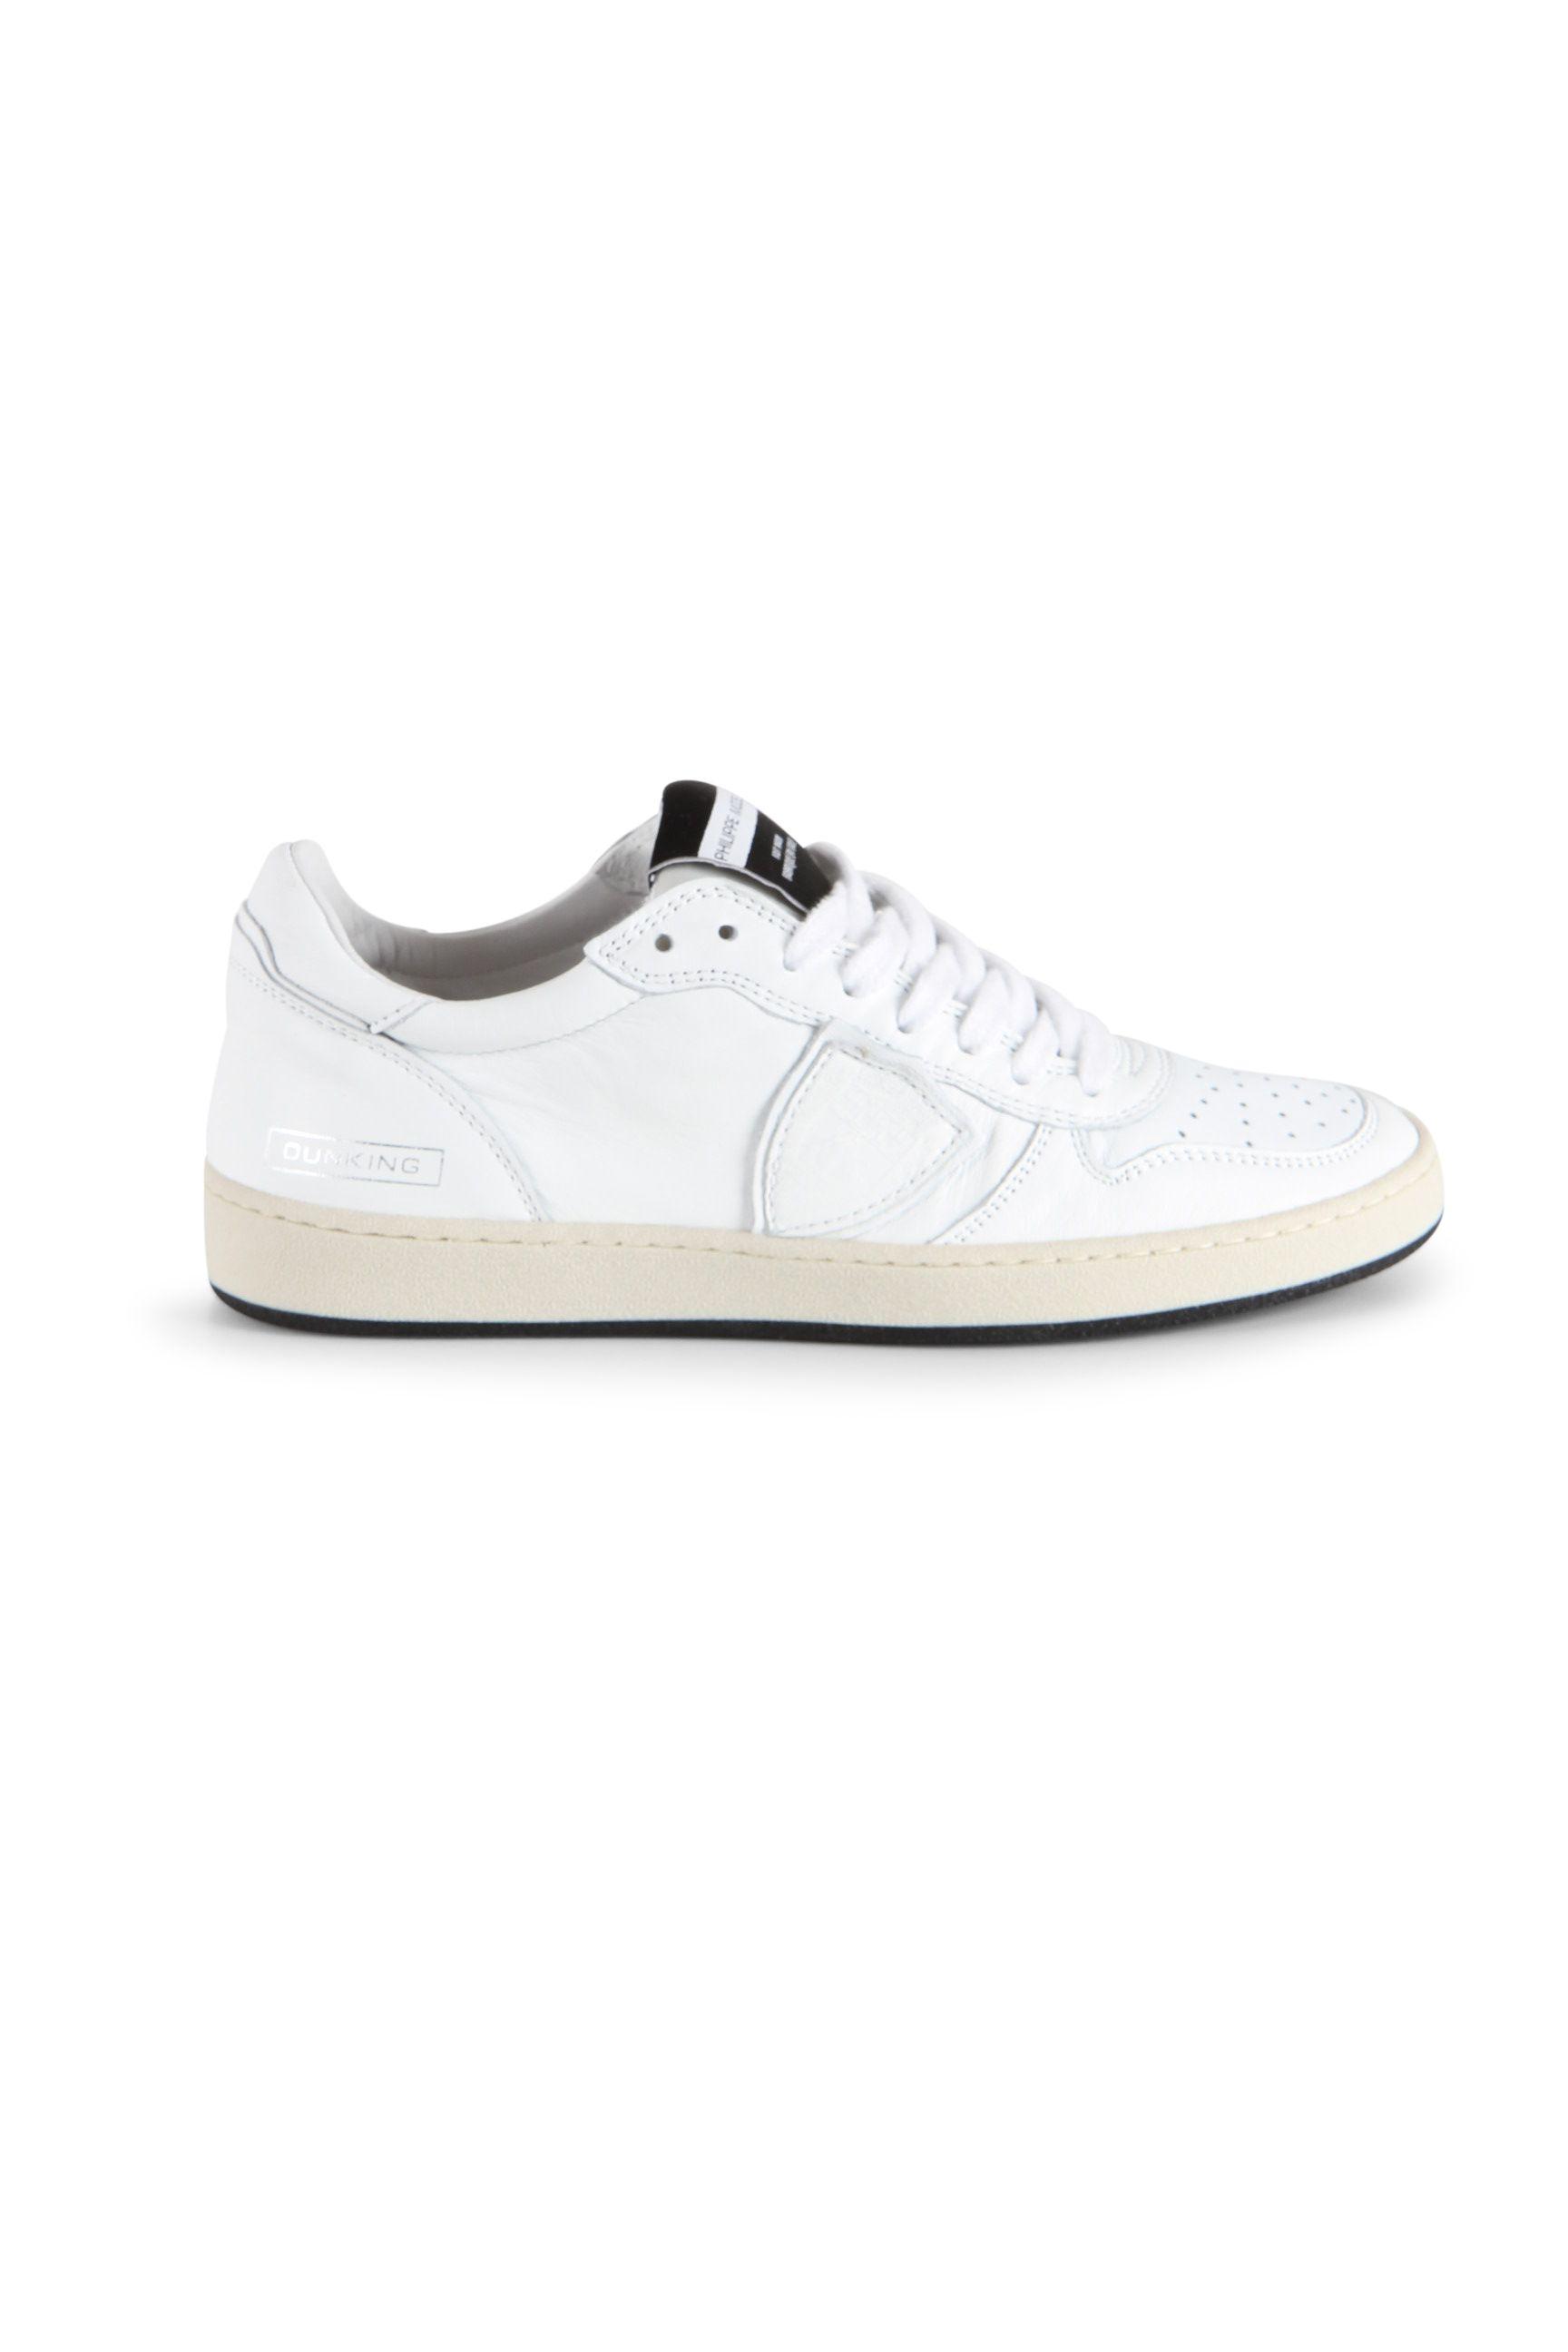 Chaussures De Sport À Retrodesign s4BMQqG7i